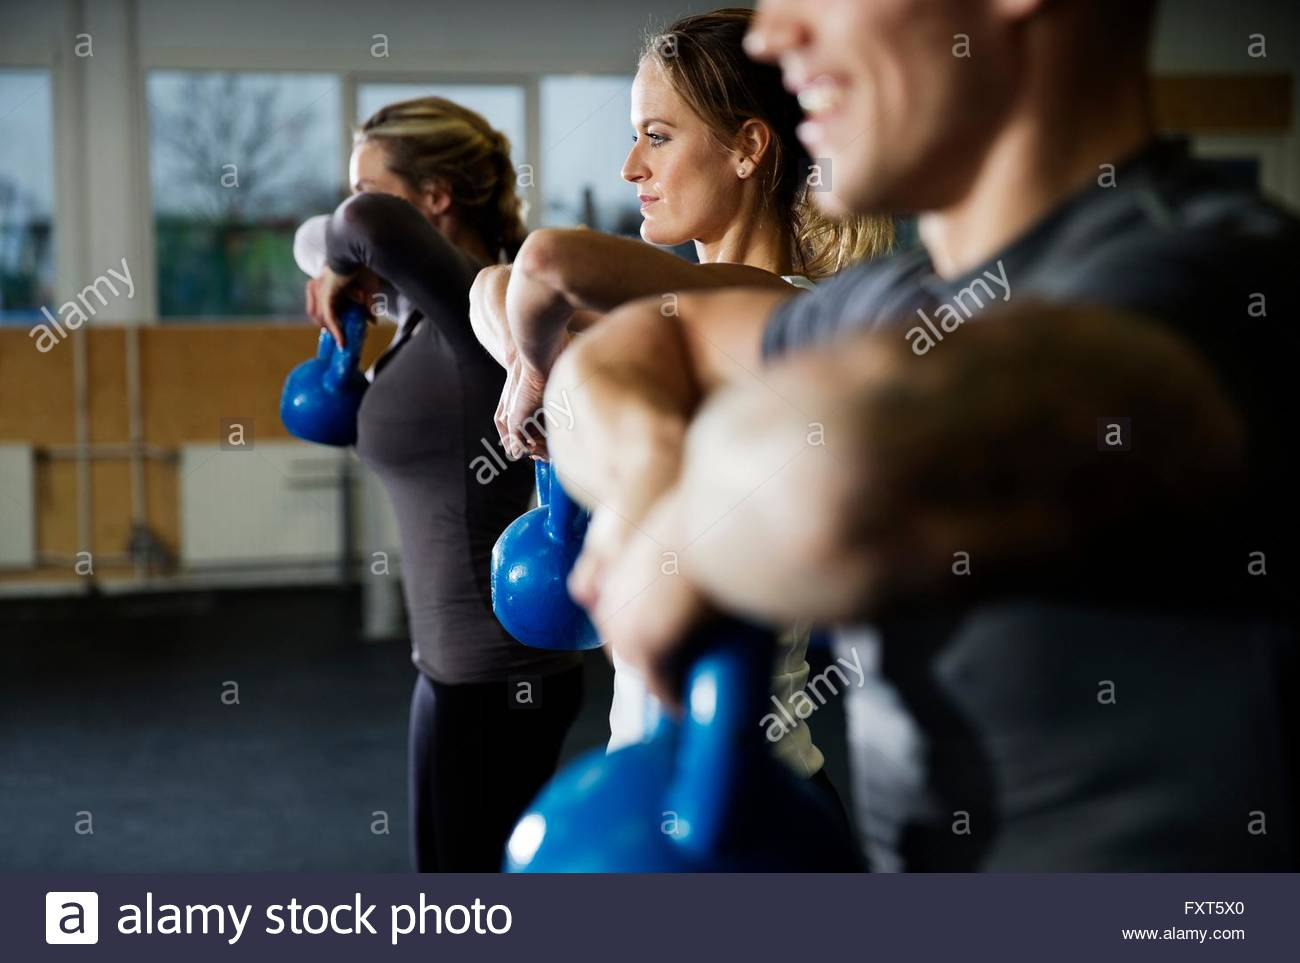 Rangée d'hommes et femmes en formation avec kettlebells sport Photo Stock